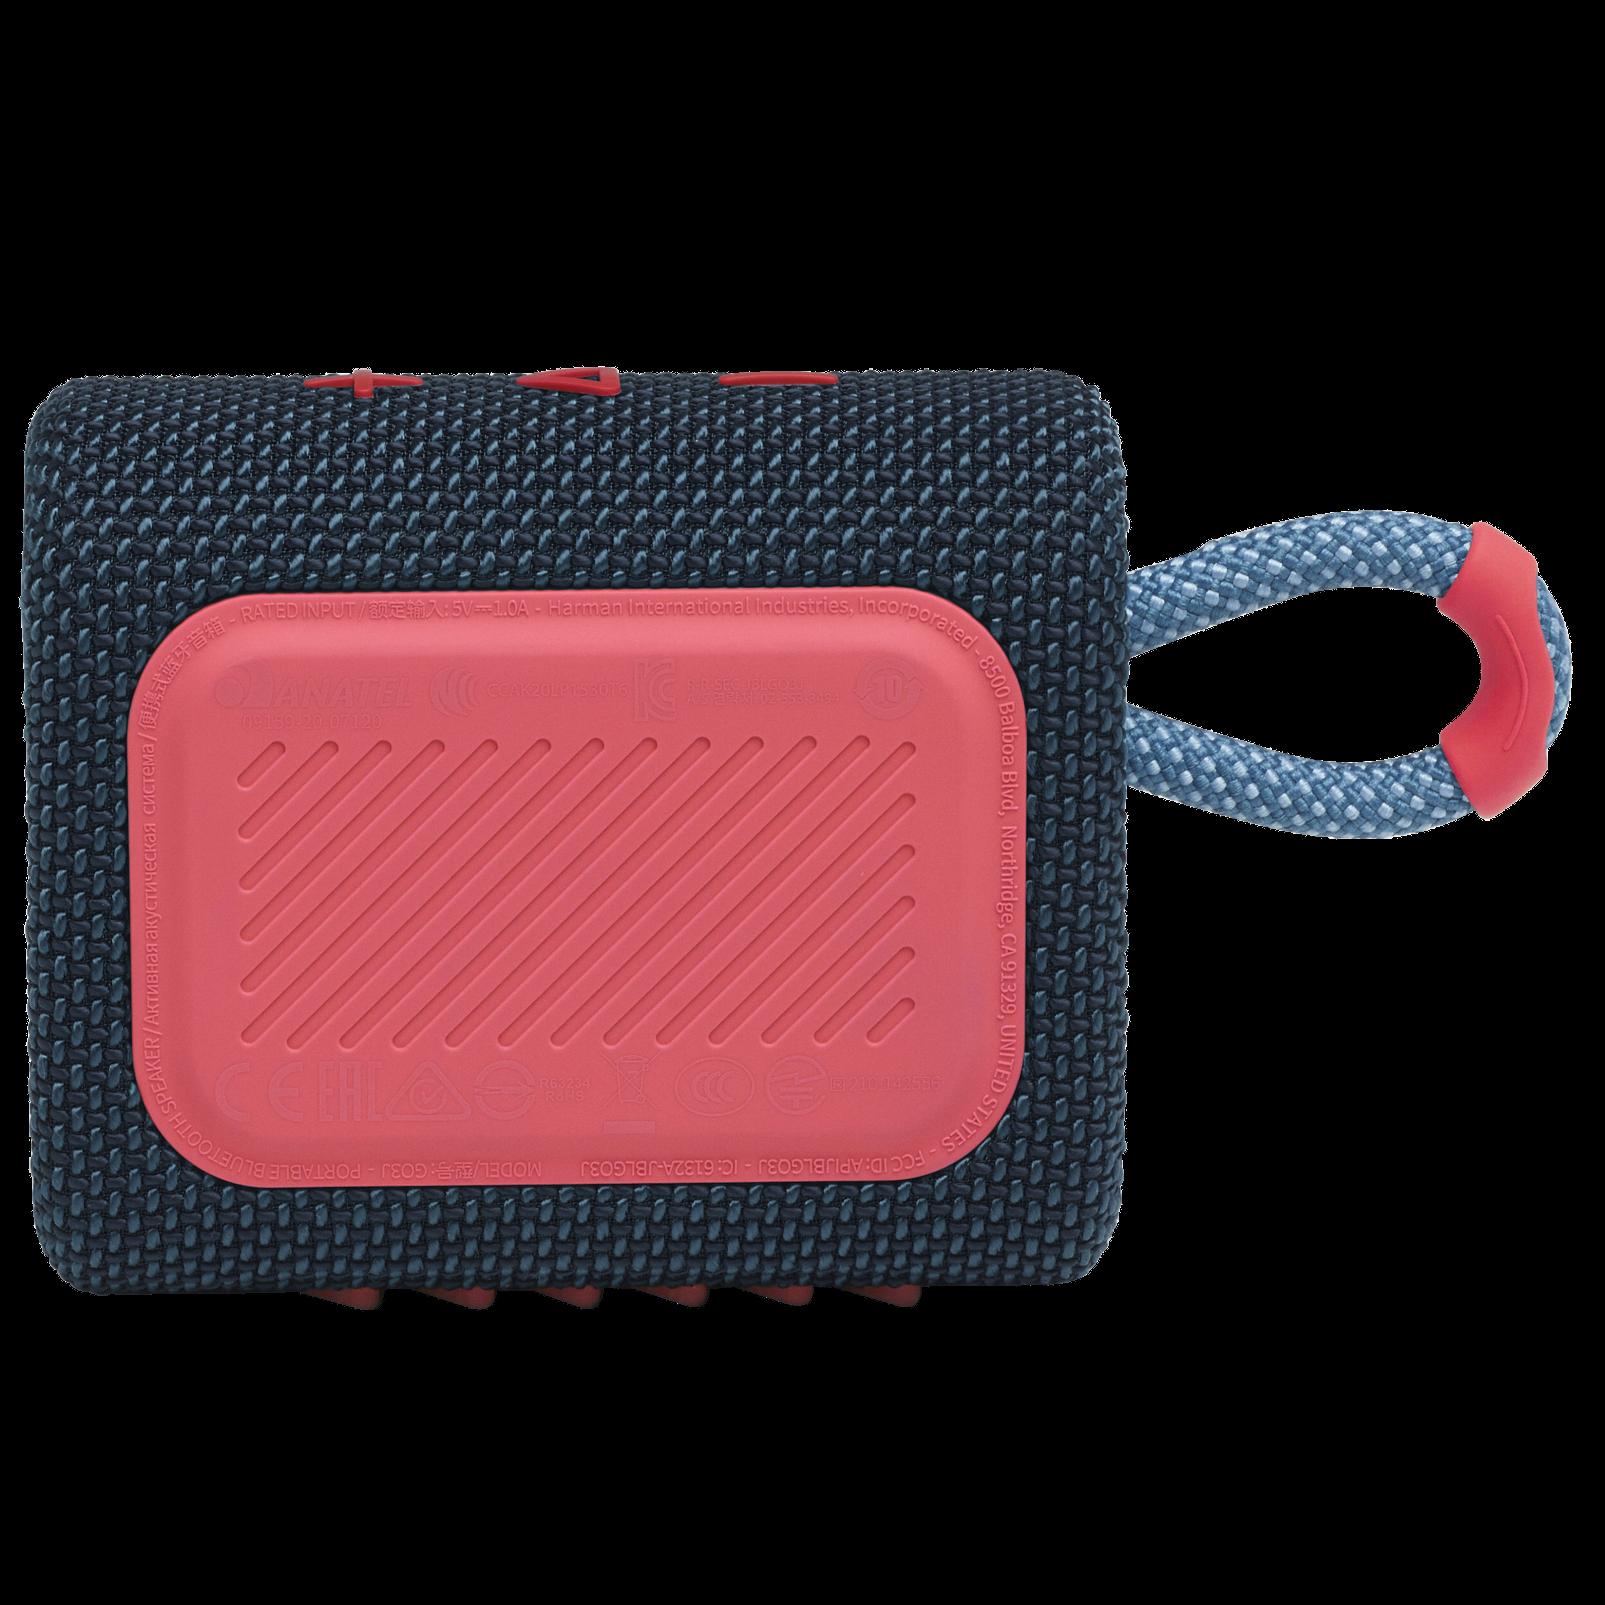 JBL Go 3 - Blue / Pink - Portable Waterproof Speaker - Back